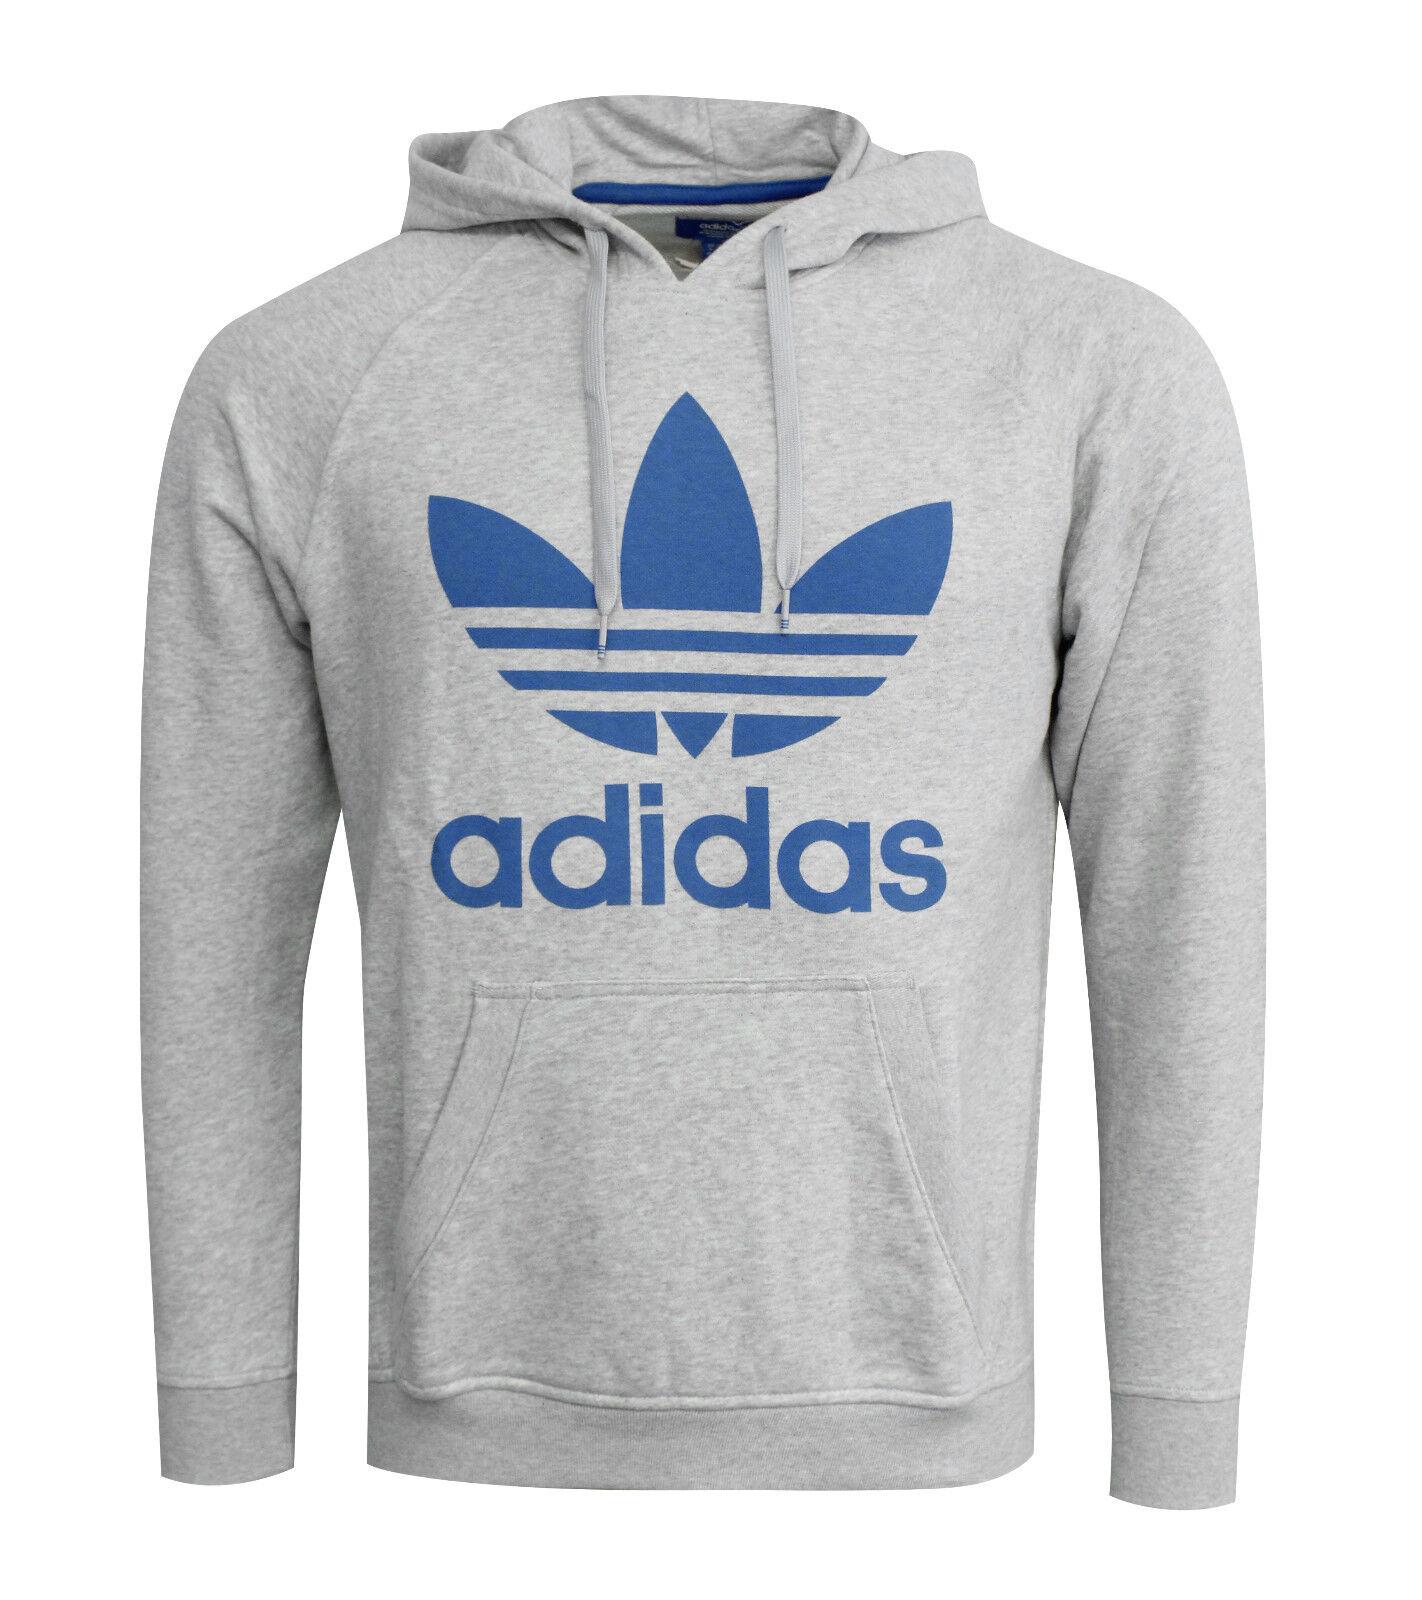 Adidas Originals Herren Herren Herren Trefoil Kapuzenpullover Pullover Grau S23121 R1g c8bb30